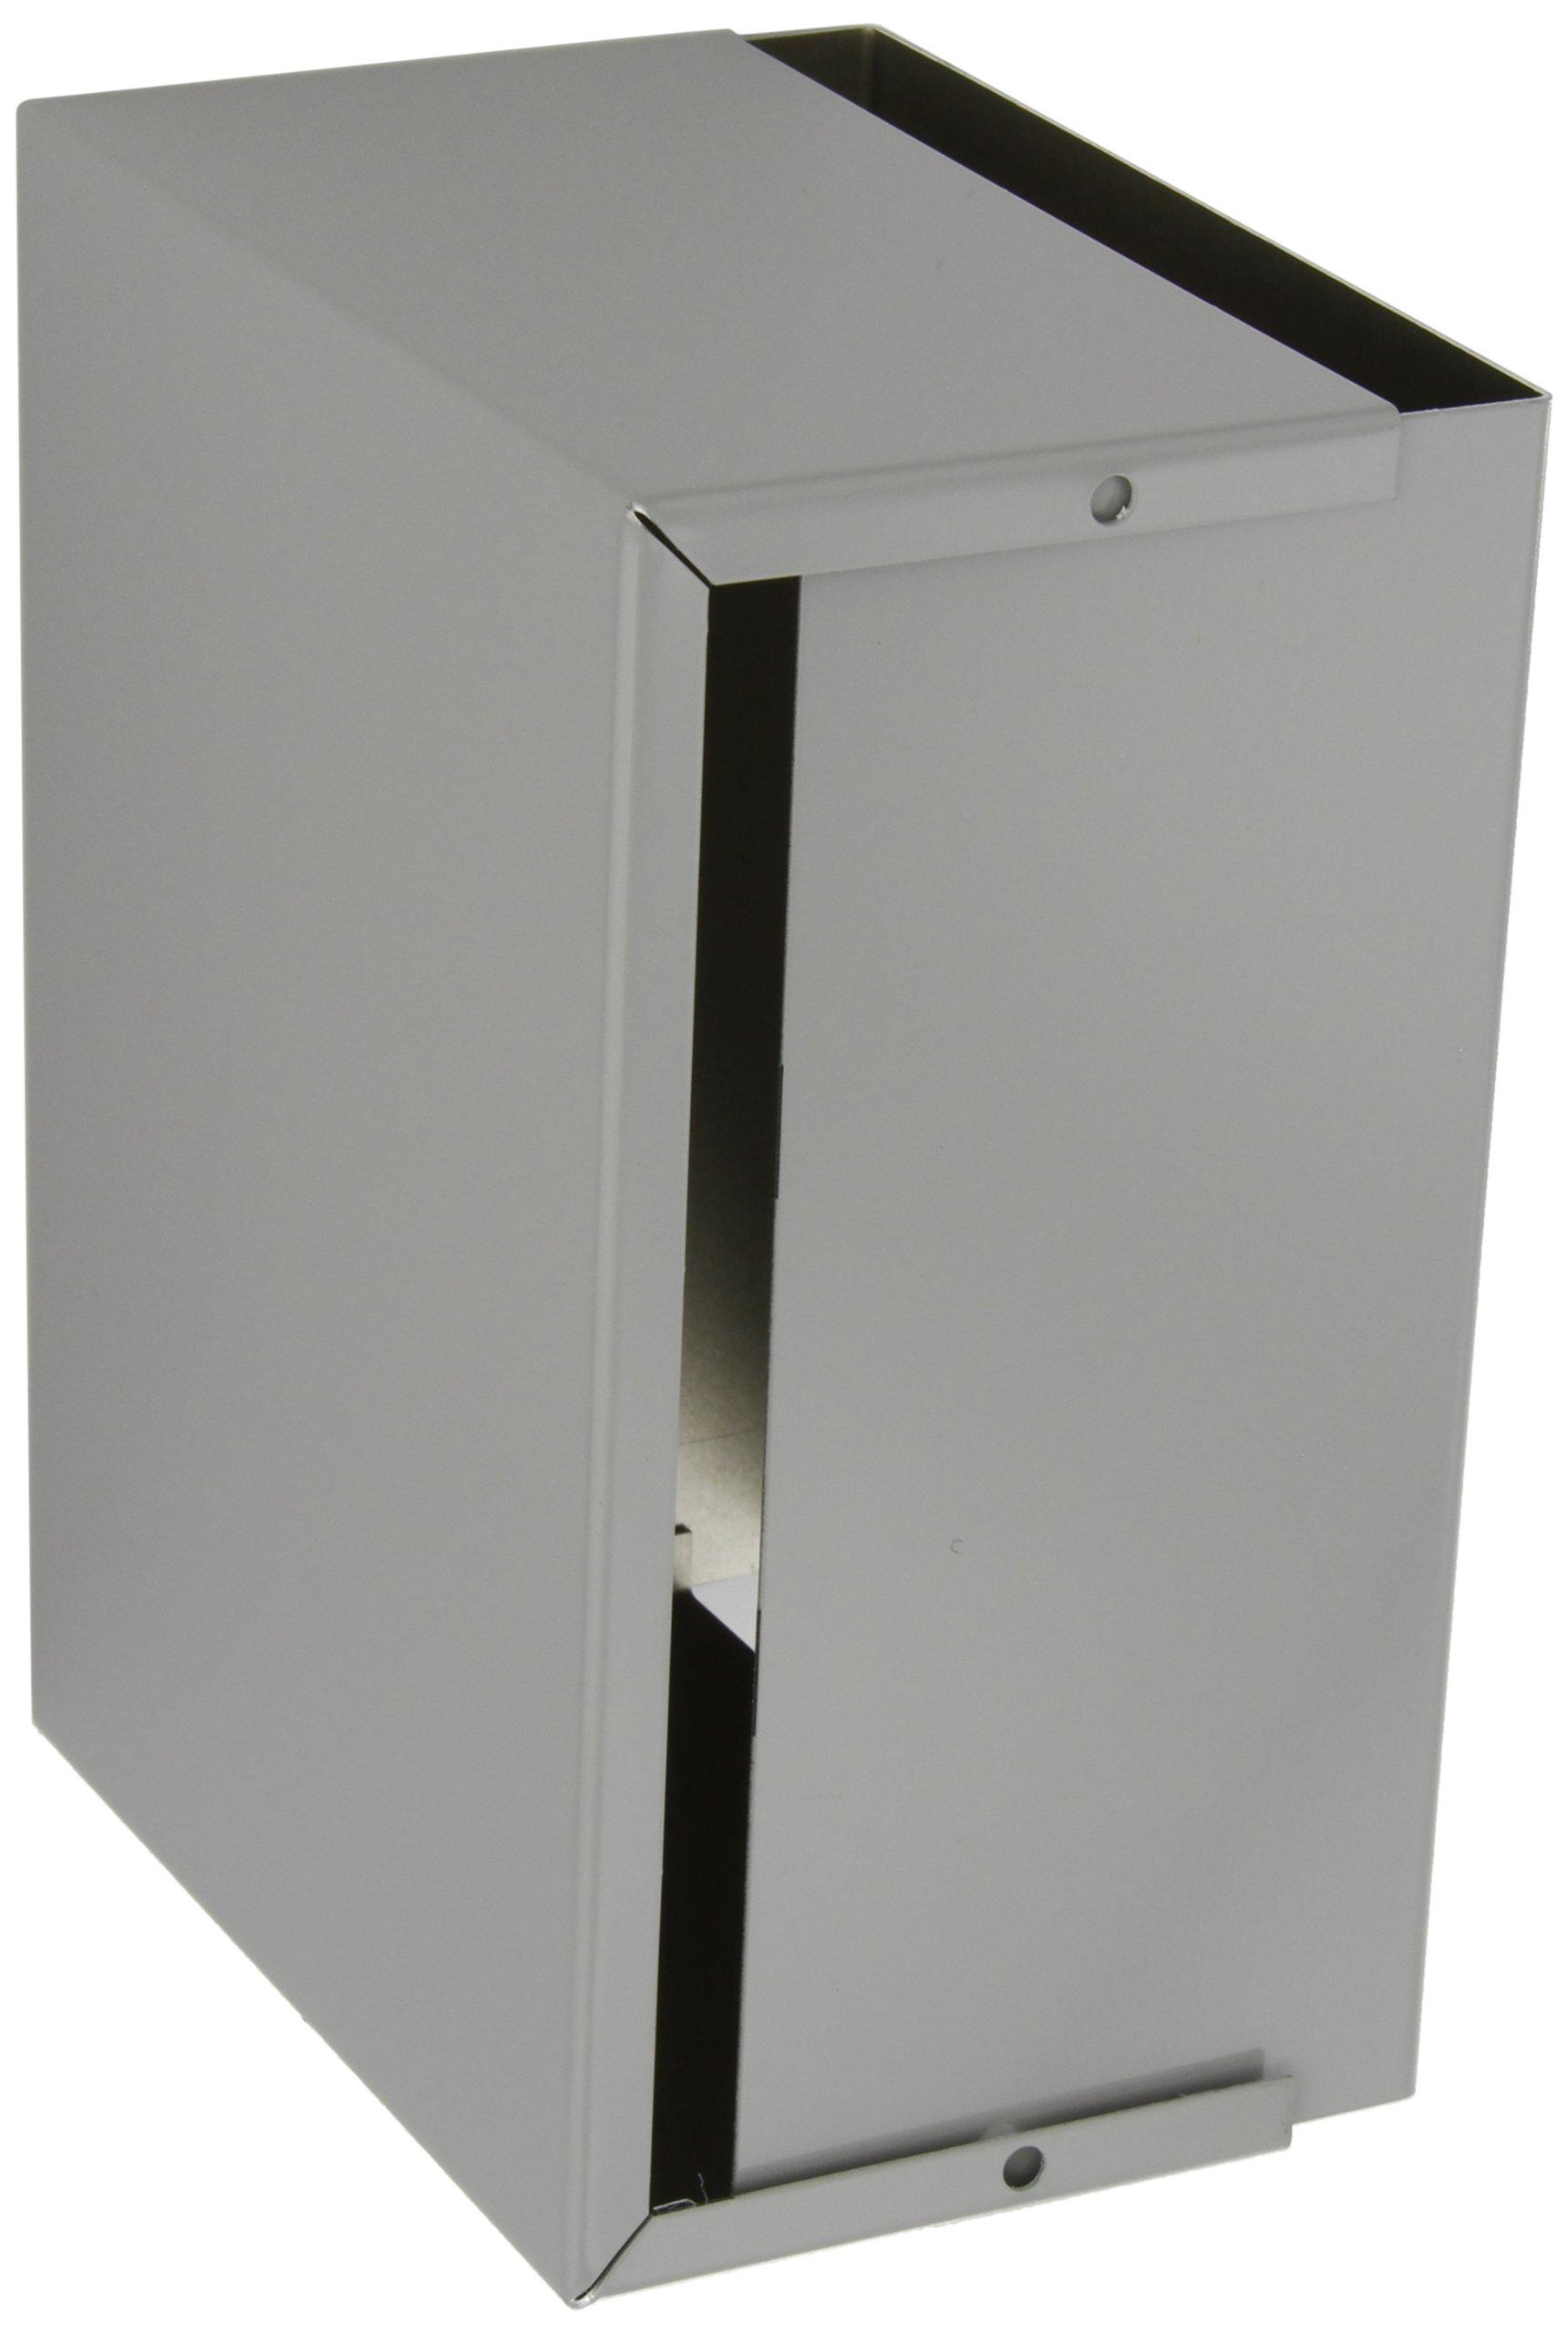 BUD Industries CU-2109-B Aluminum Electronics Minibox, 8'' Length x 6'' Width x 3-1/2'' Height, Smooth Gray Finish